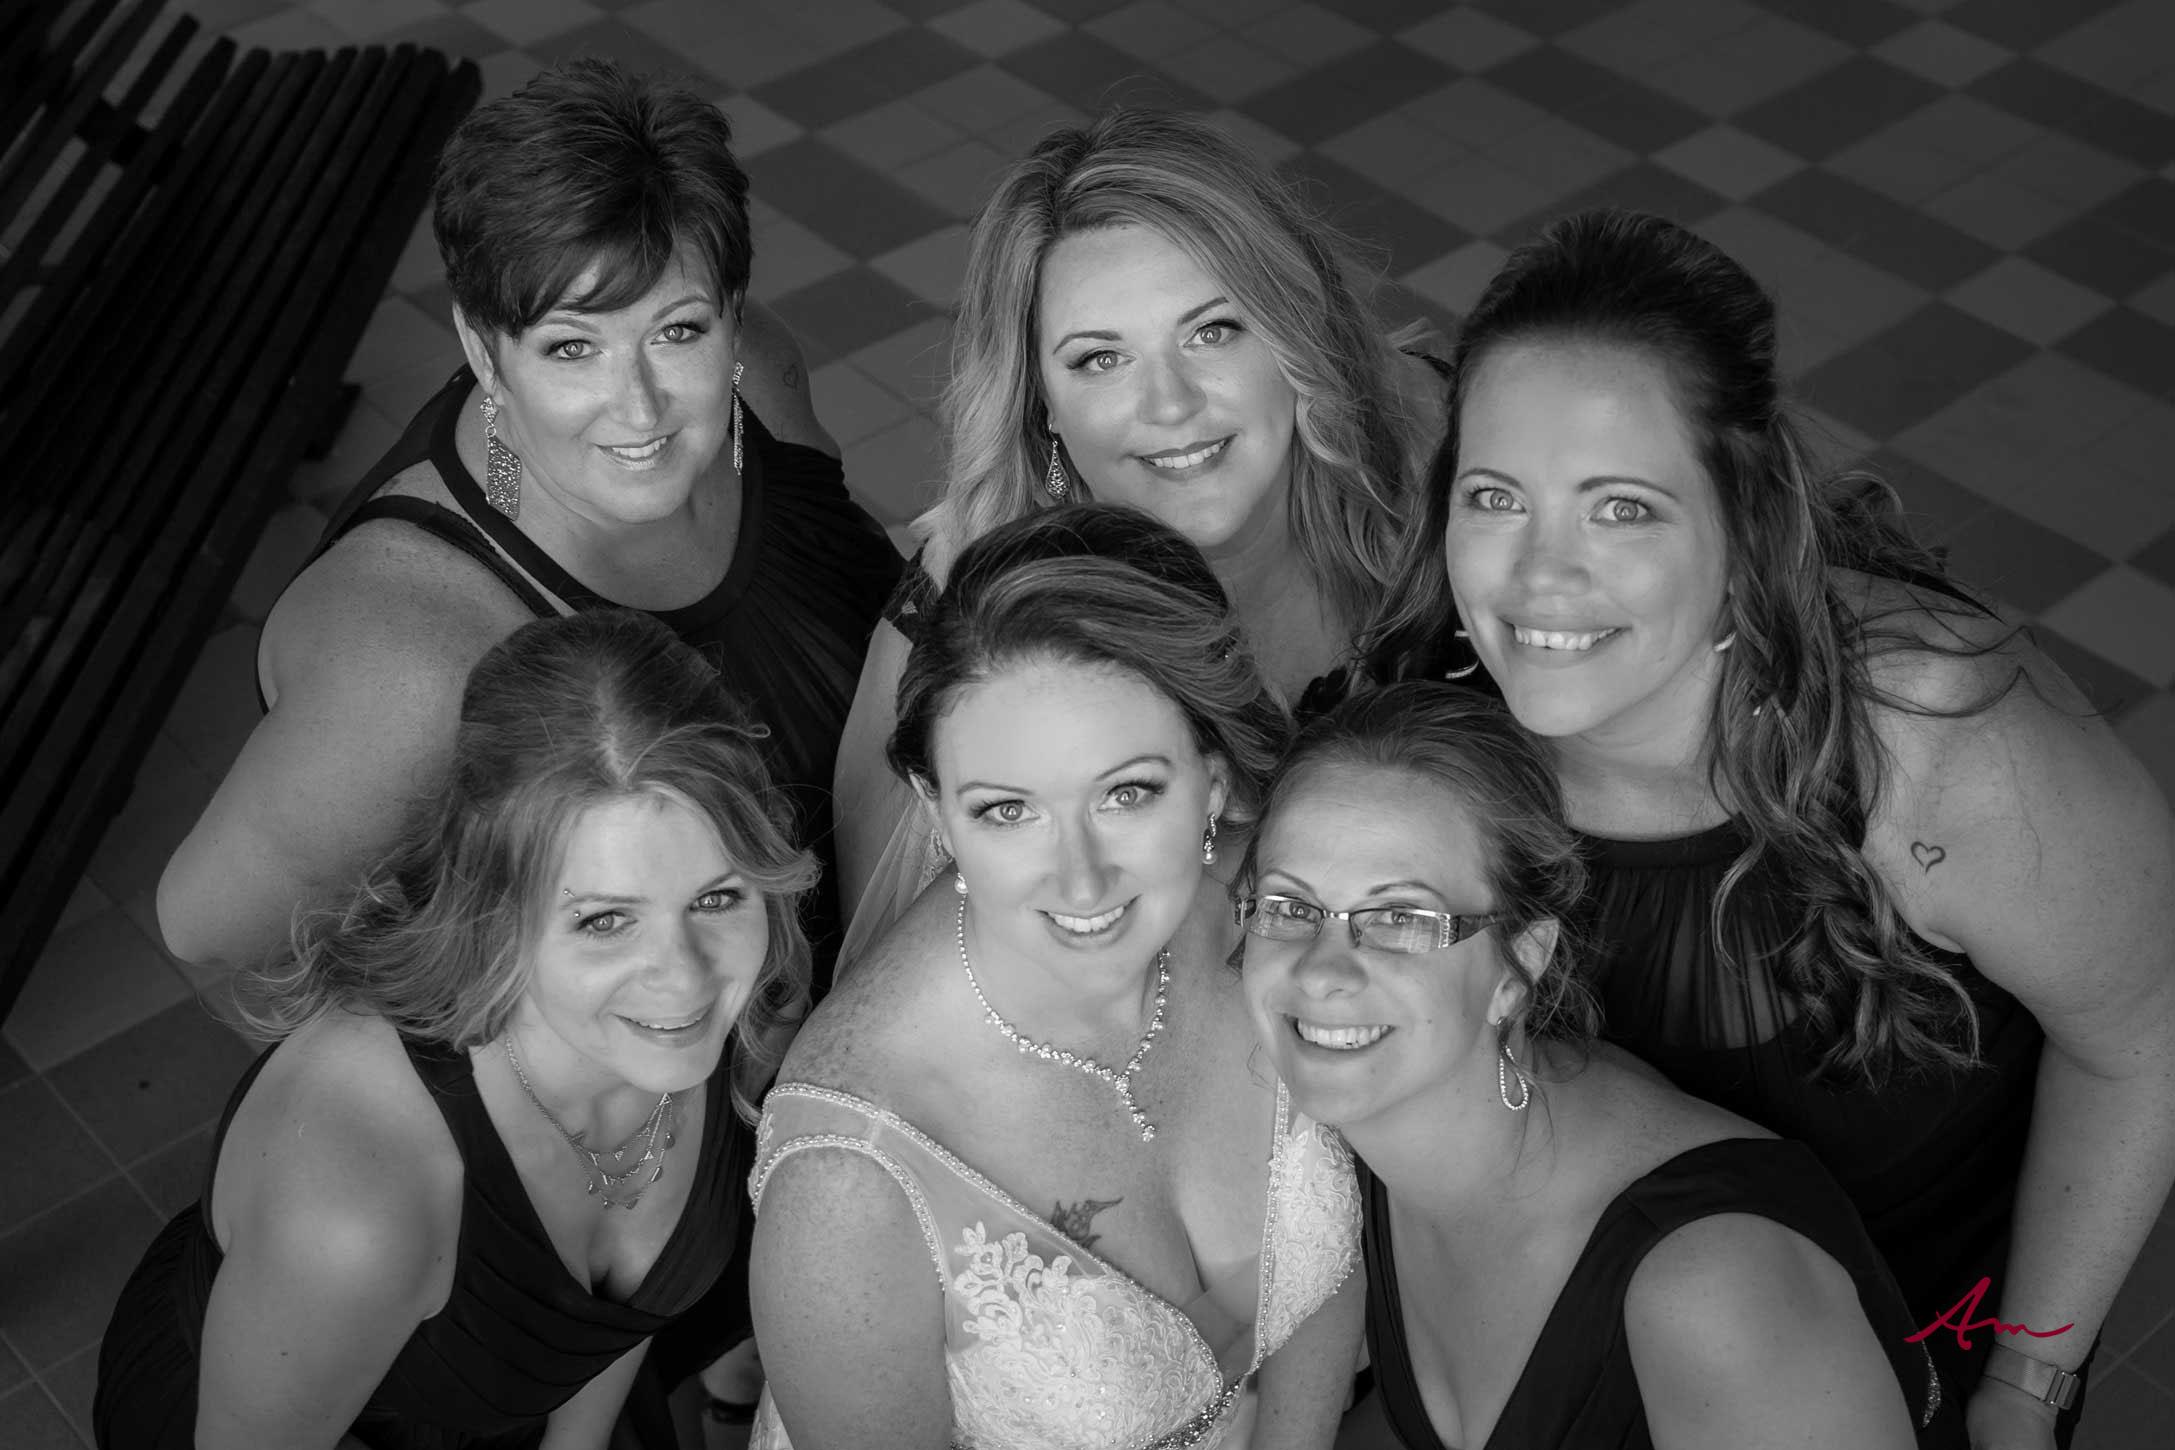 Gorgeous ladies!